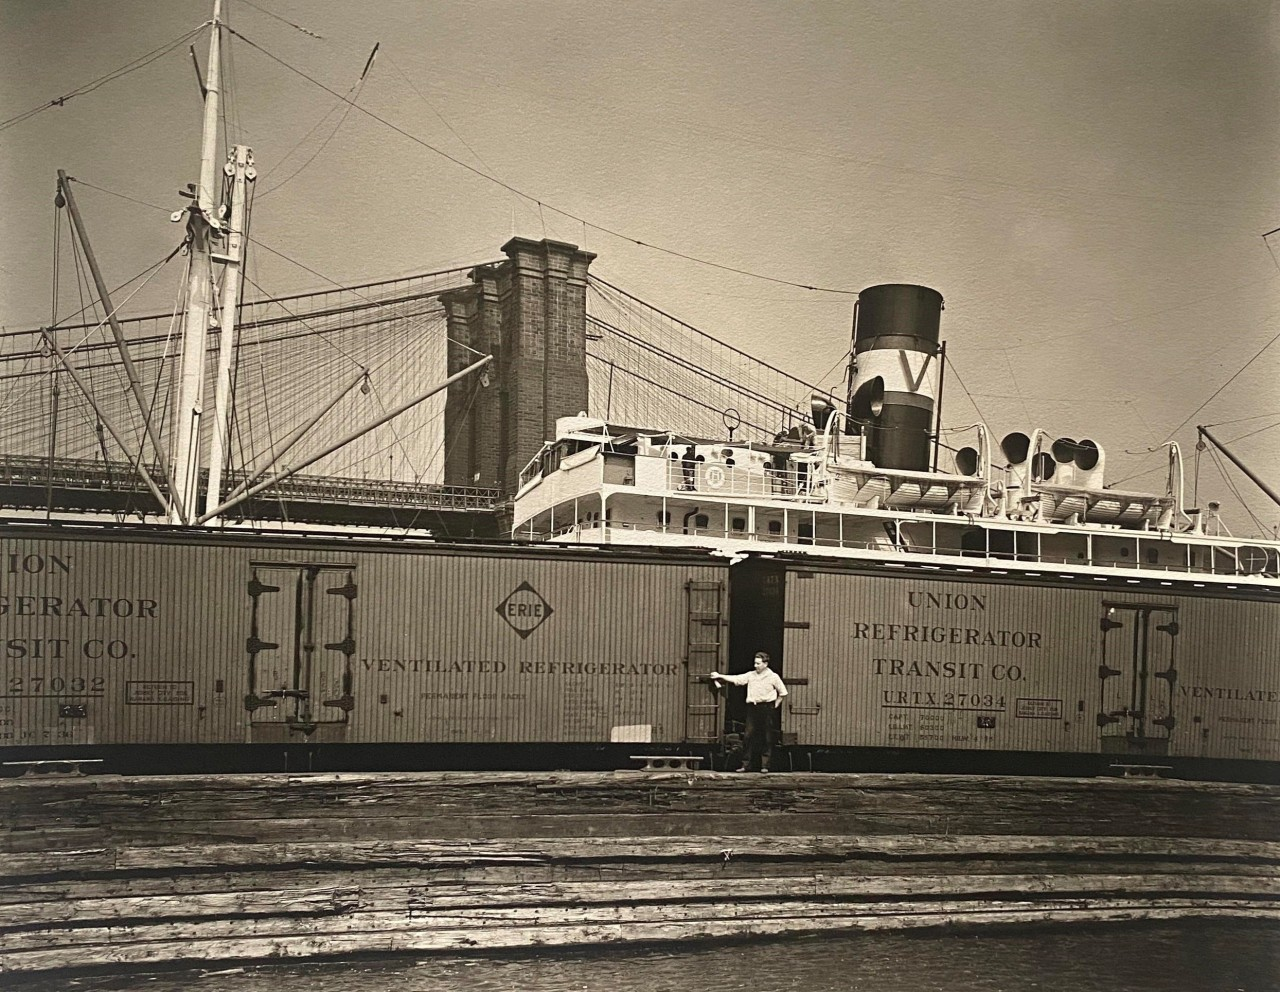 Порт с 19-го пирса, Ист-Ривер, Манхэттен, 12 августа 1936. Автор Беренис Эббот